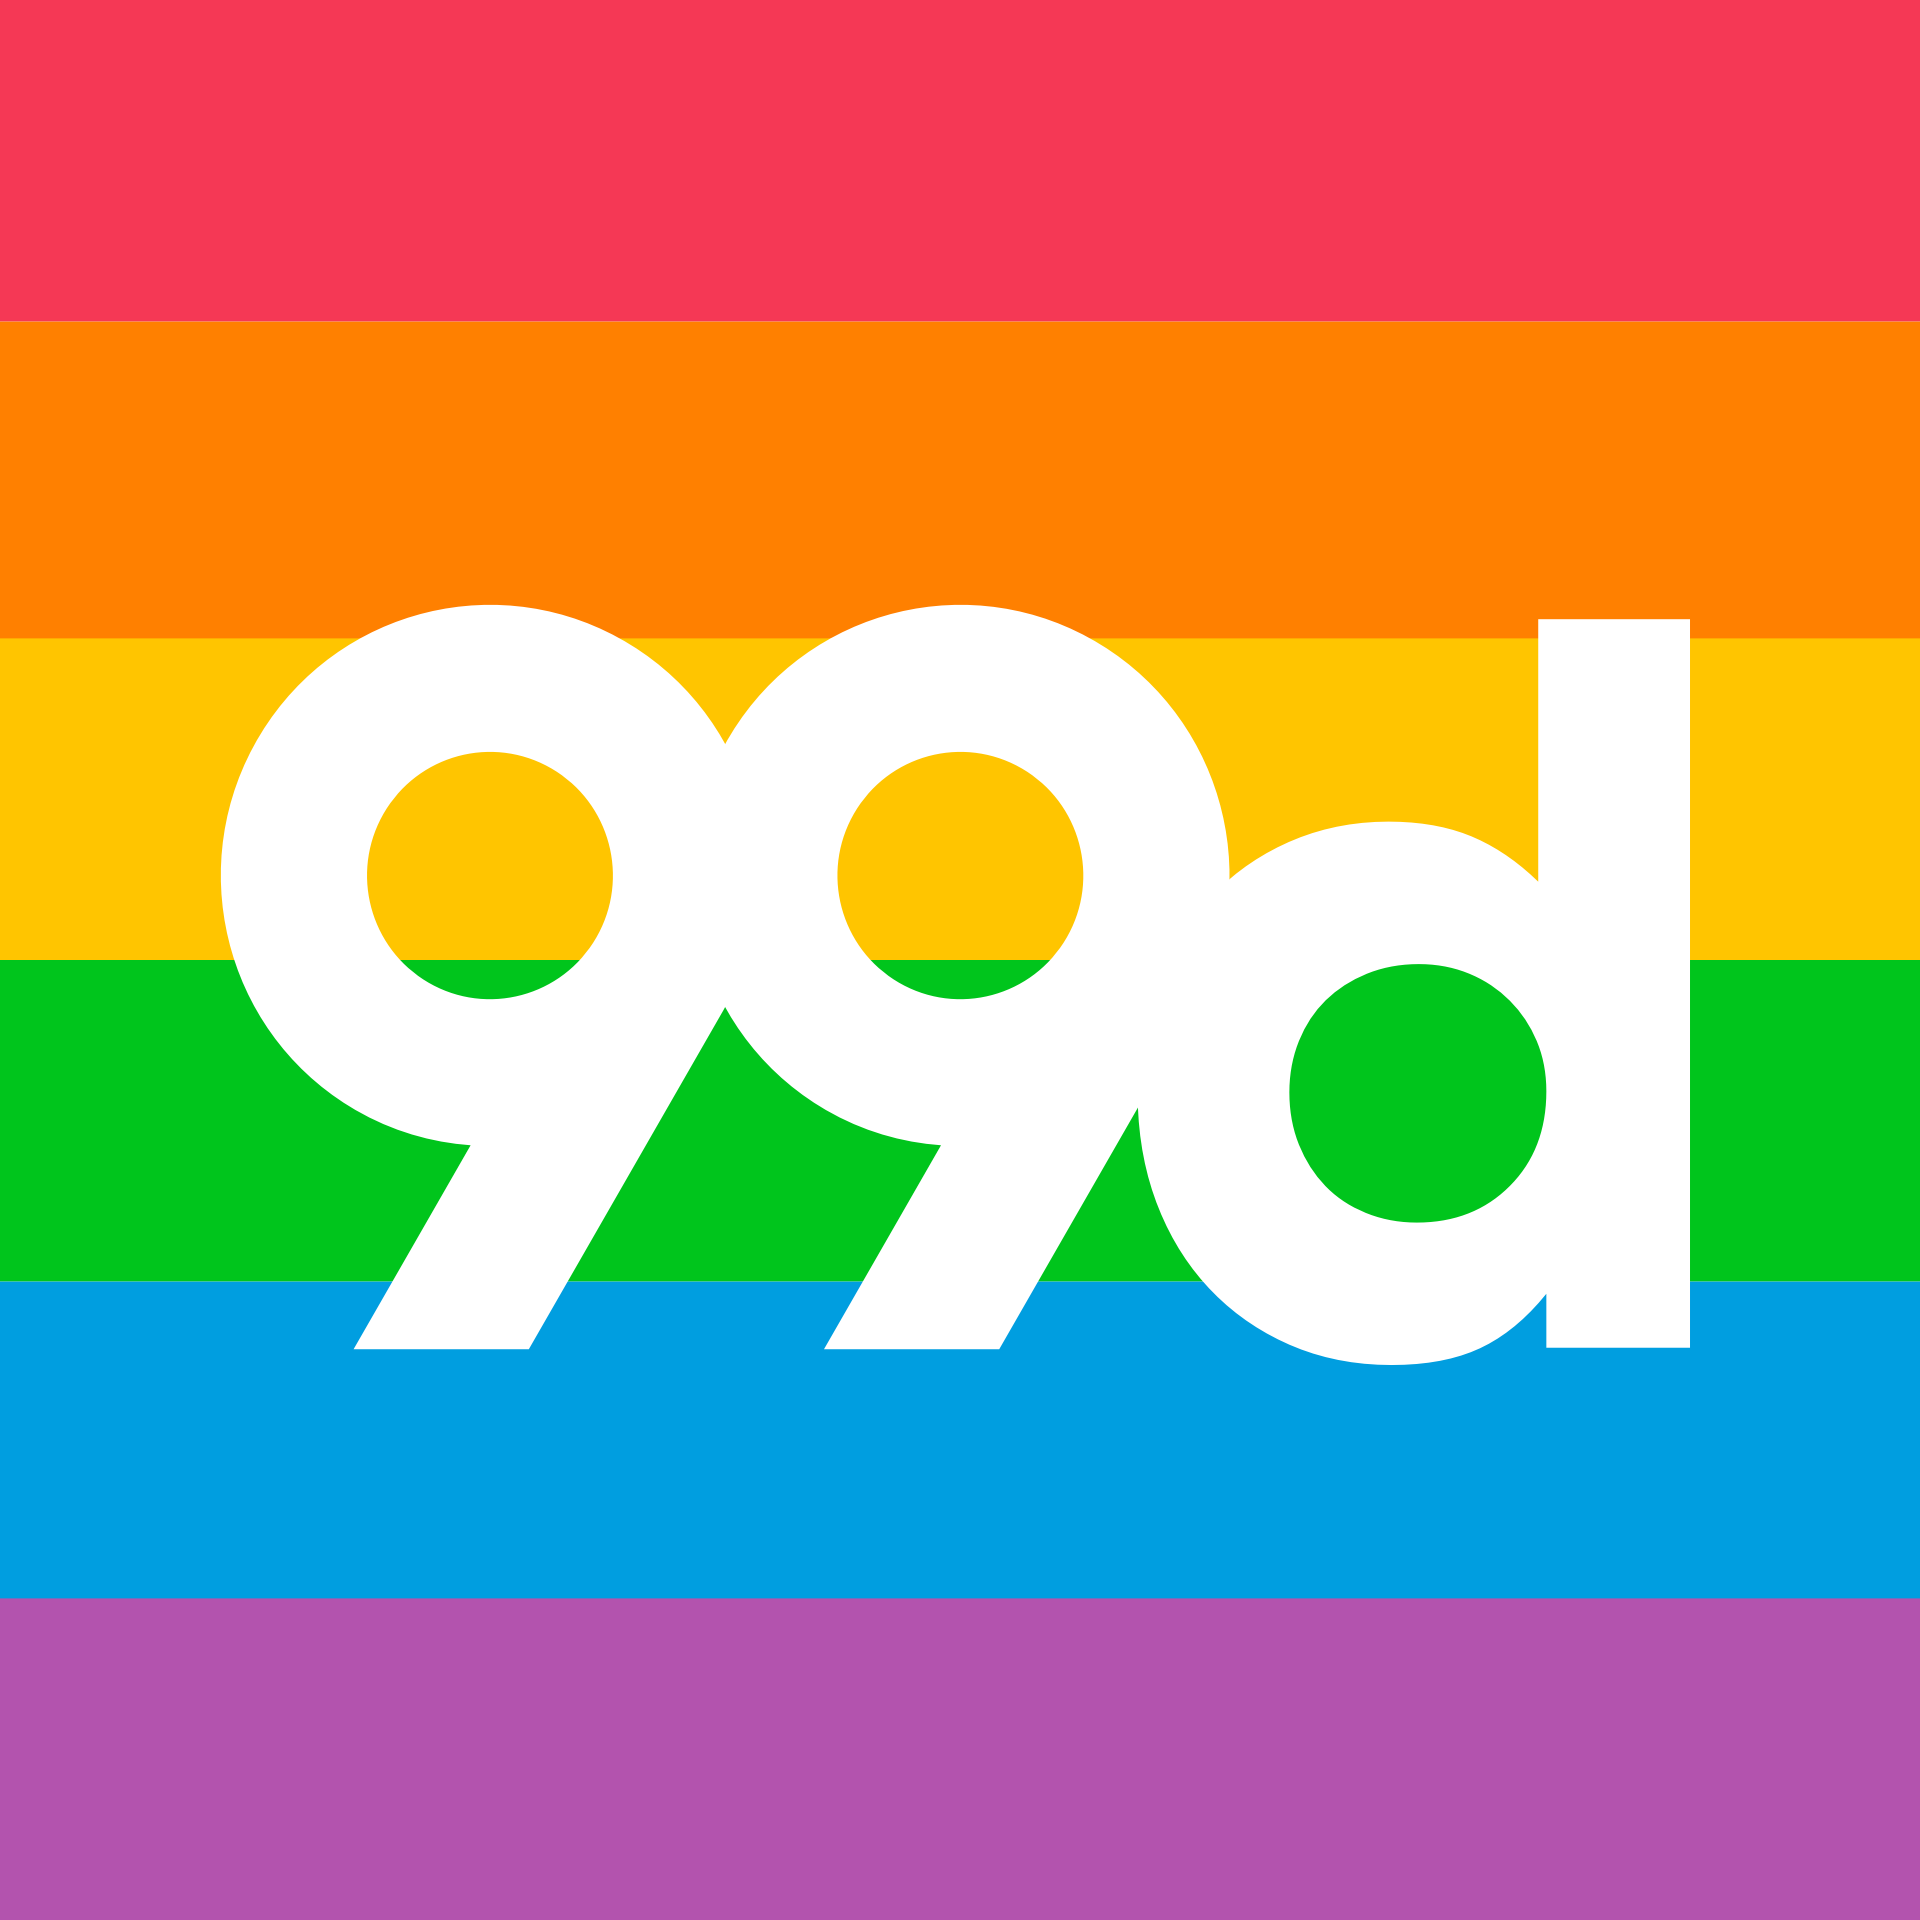 A rainbow themed version of 99designs' logo